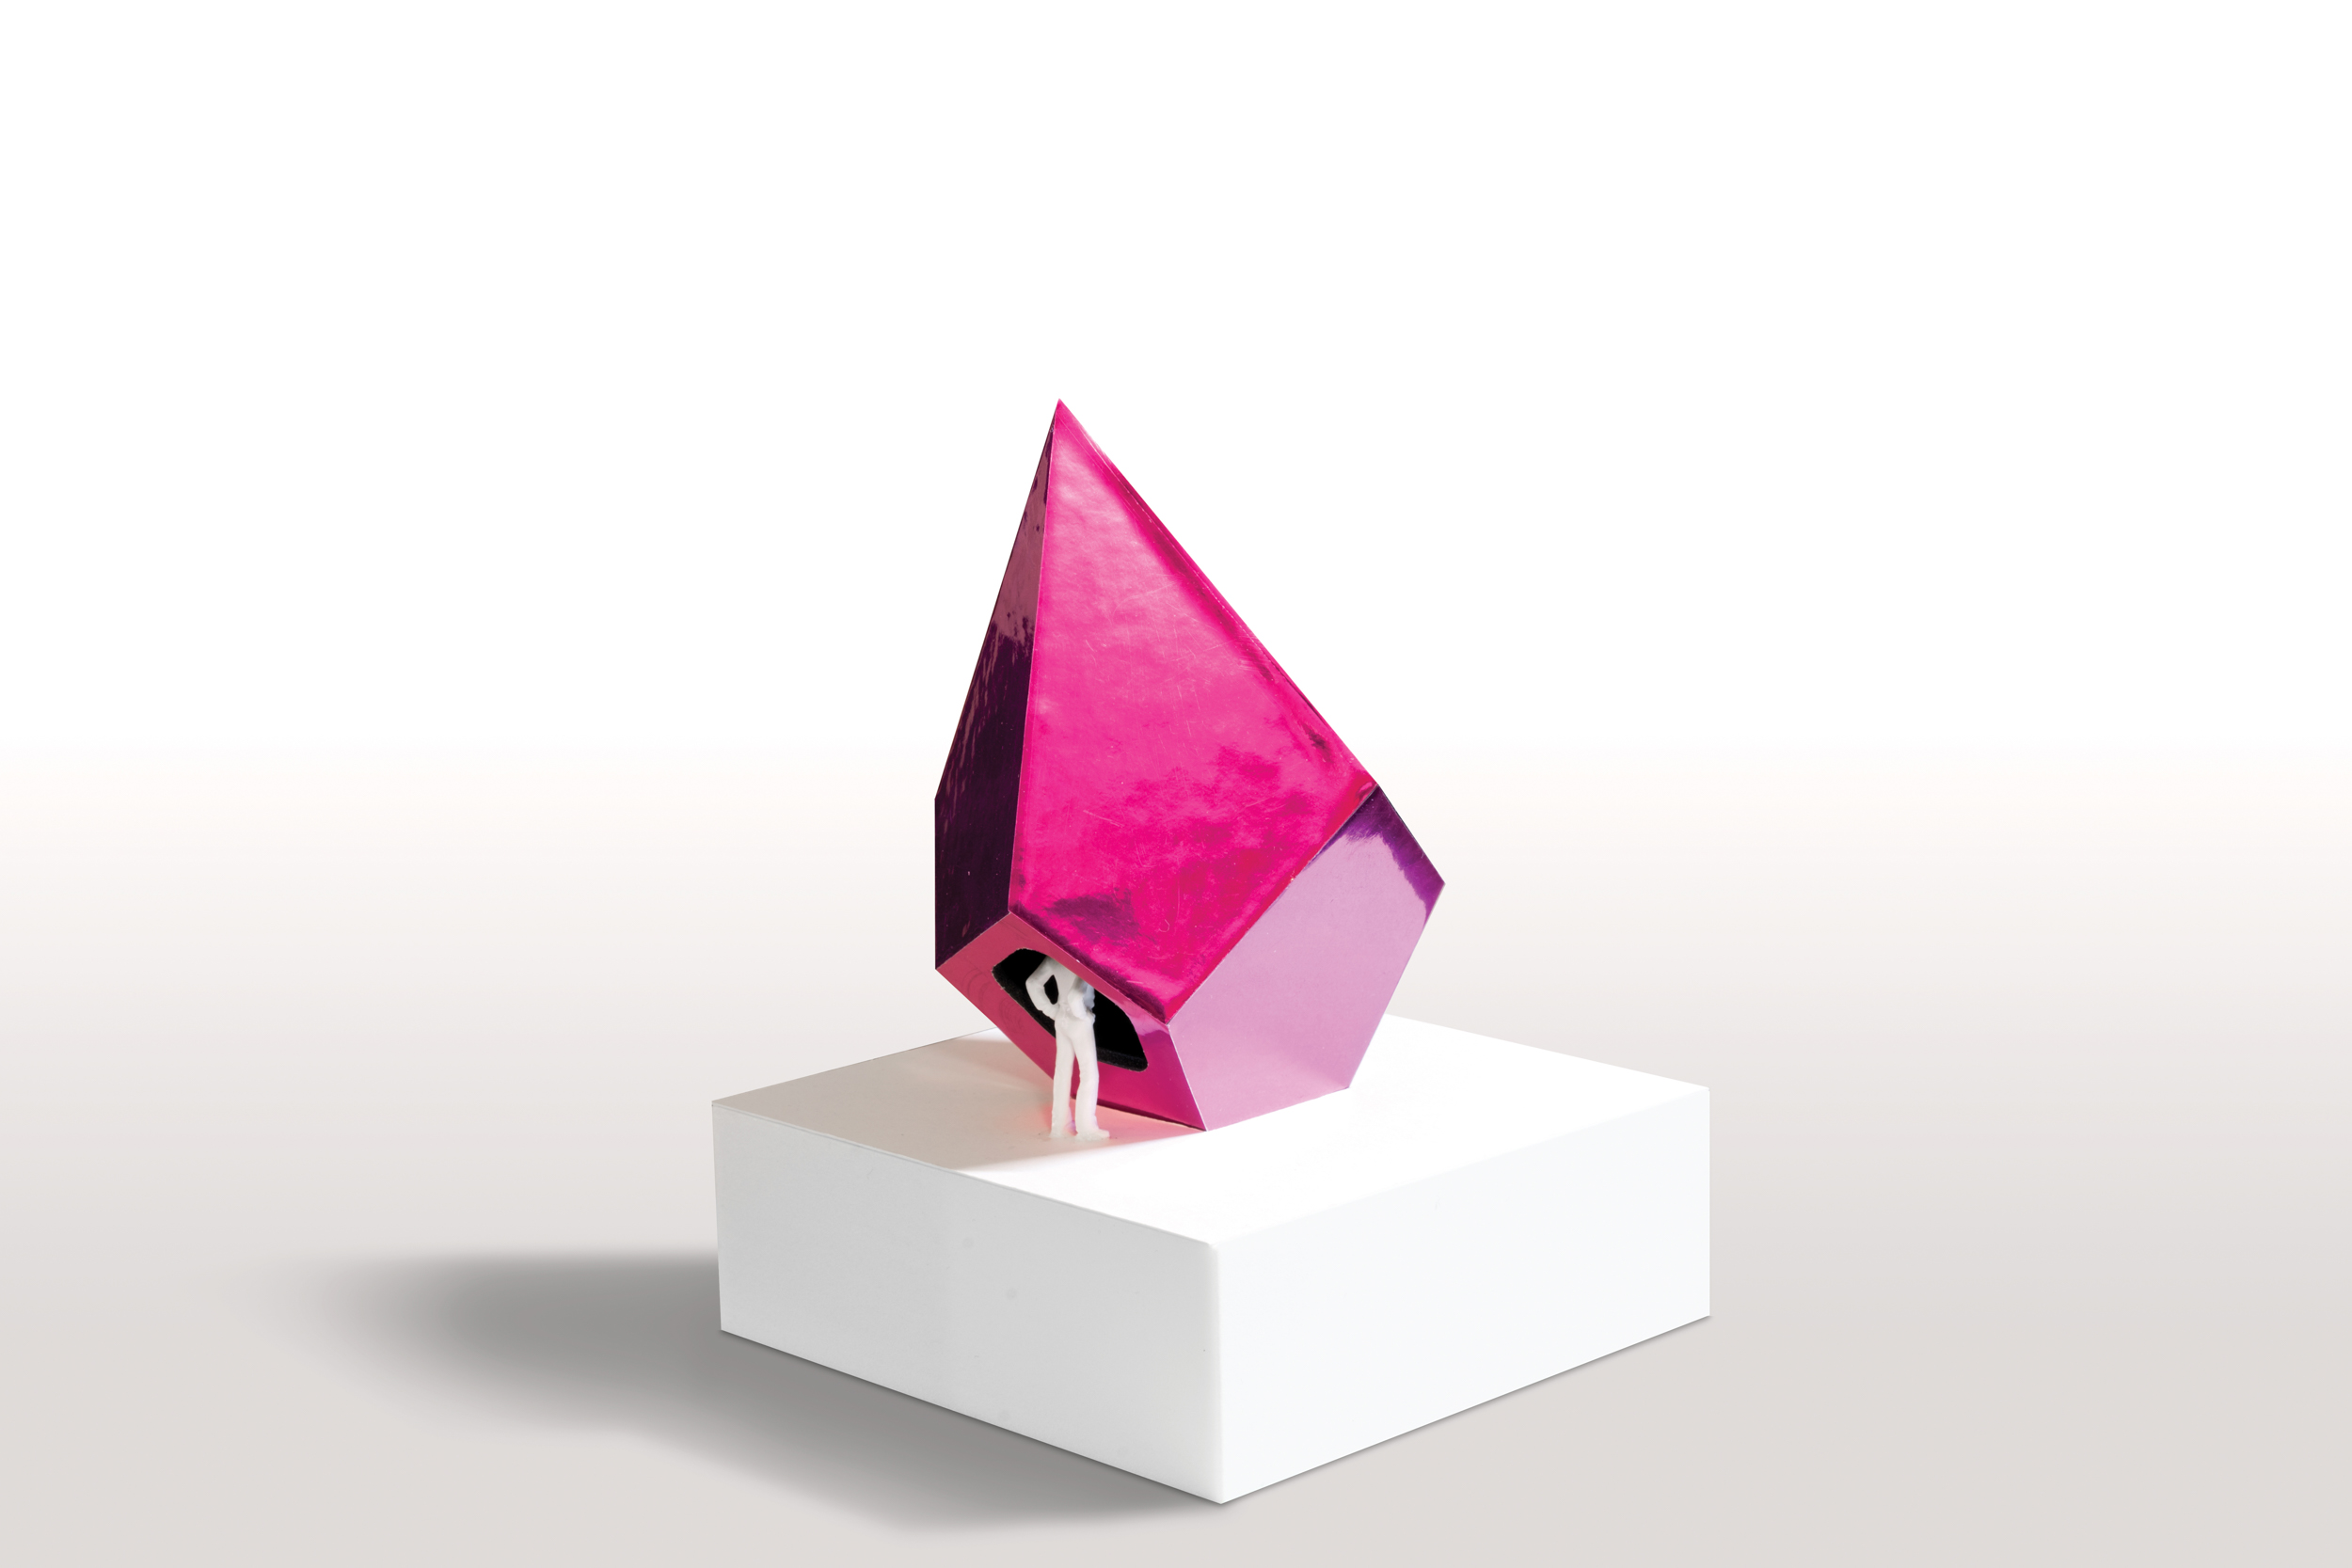 Crystal_3.jpg